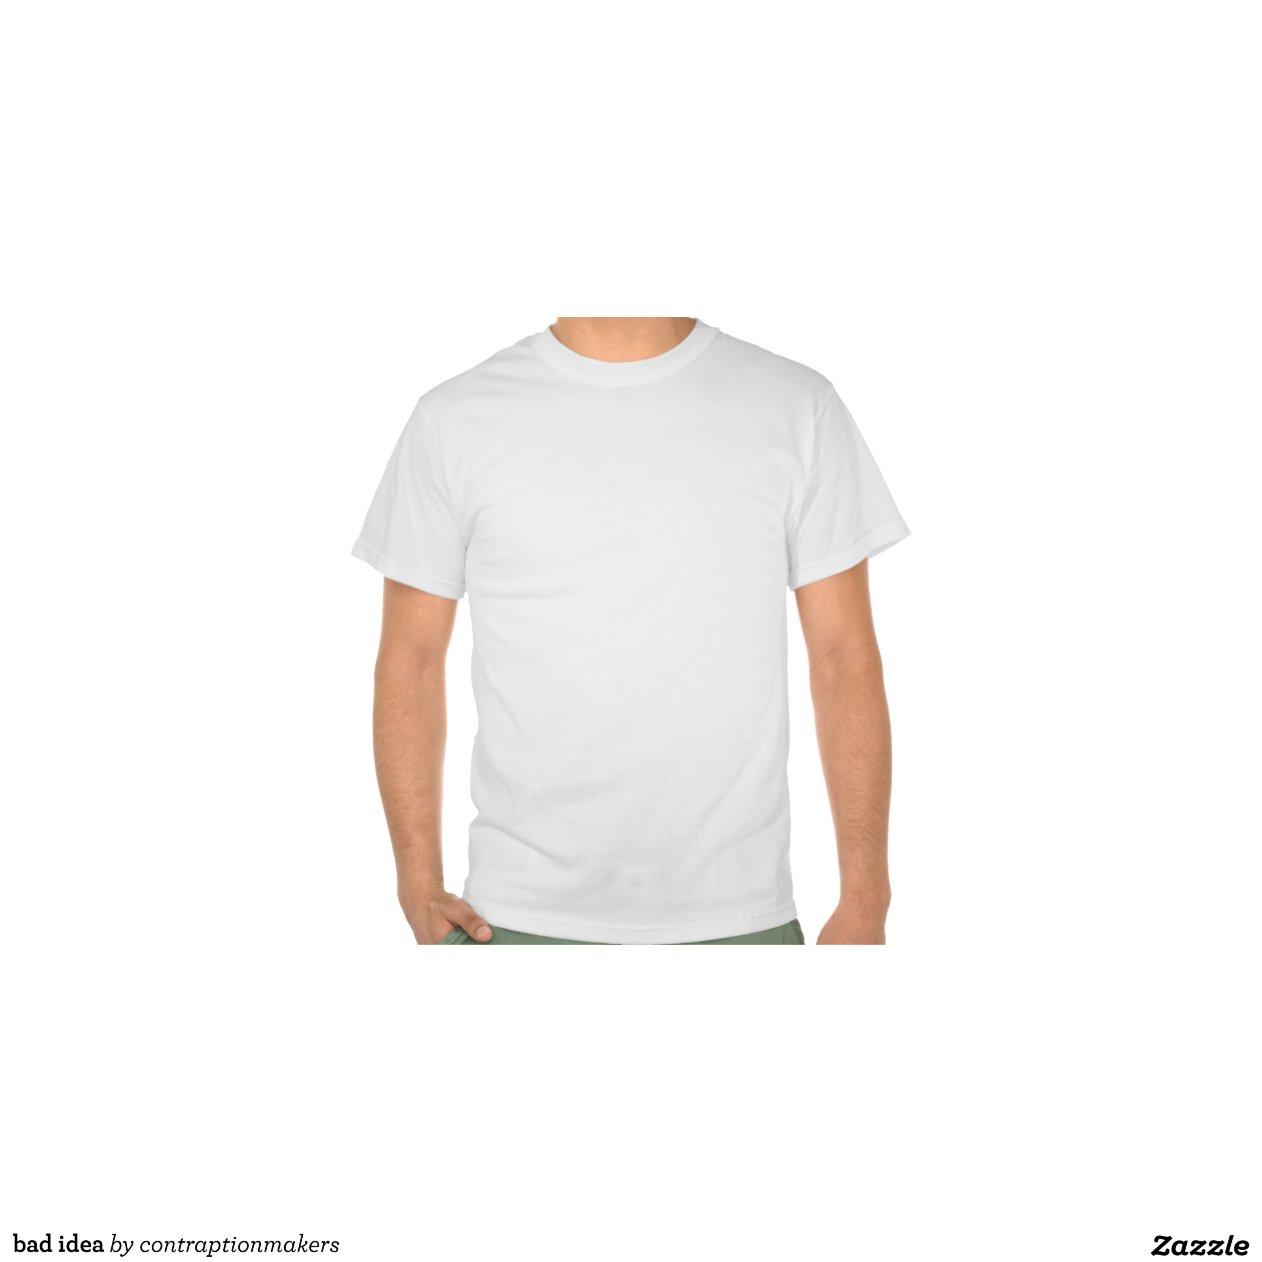 Bad idea tshirts r4a36c3f33ec64993a6cf093c2146ed34 804gy 1200 jpg view